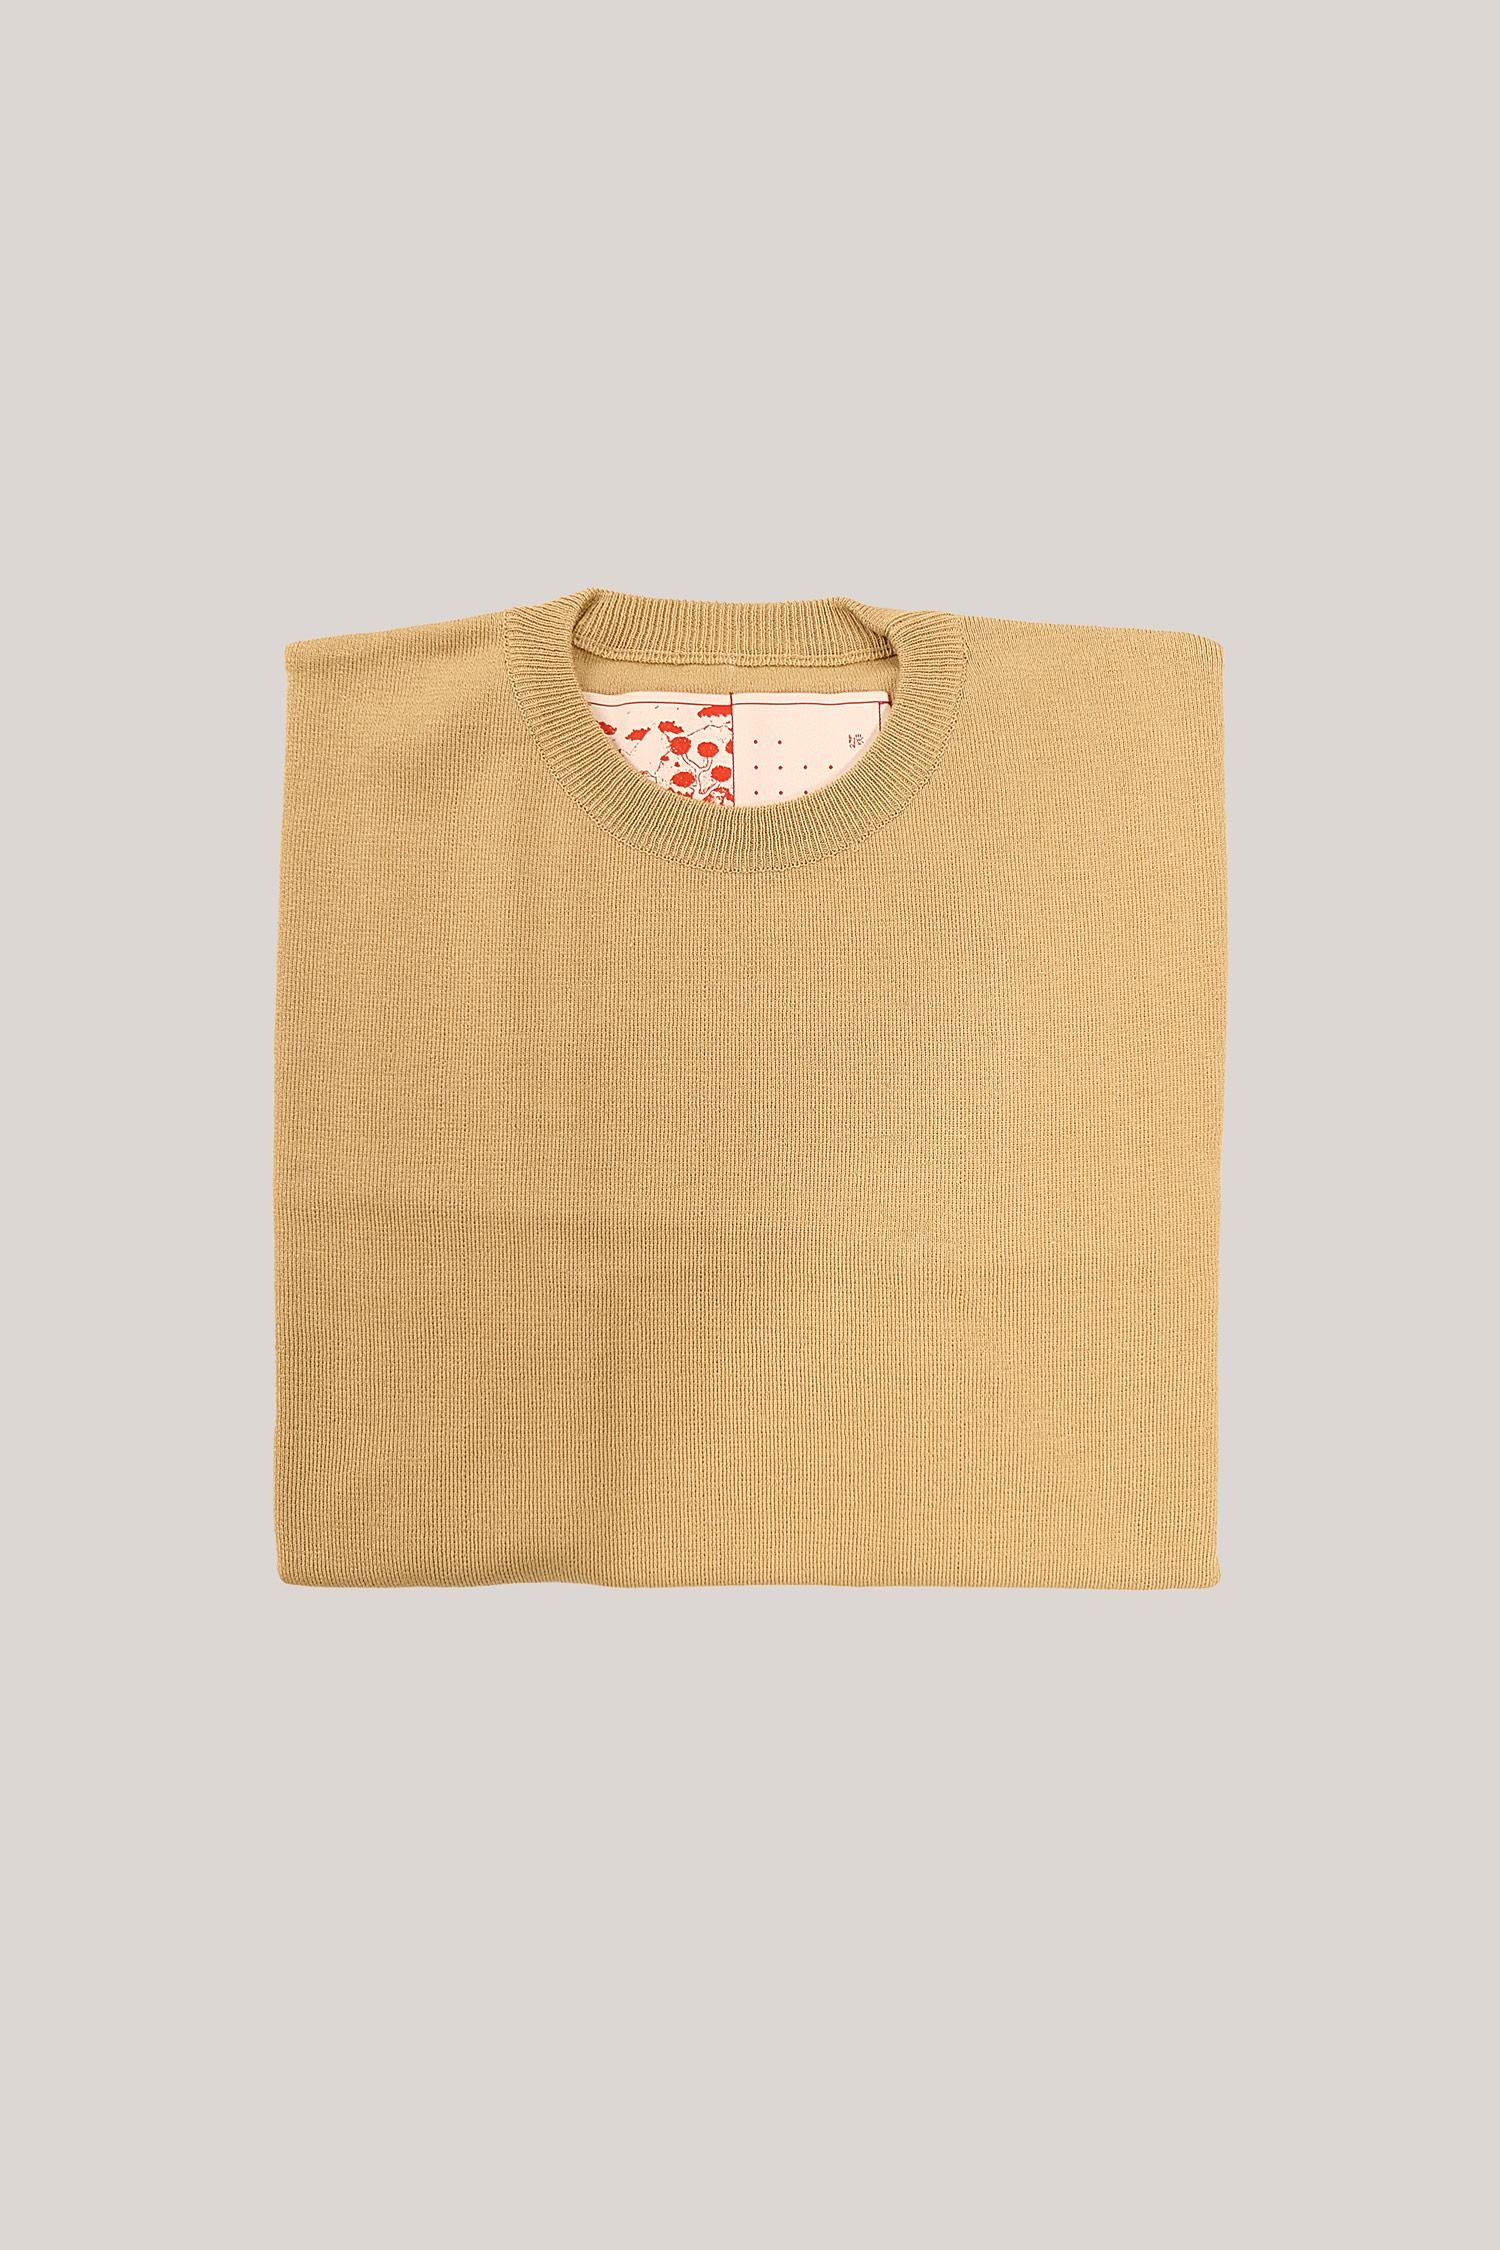 37-Knitted-tshirt-beige-3